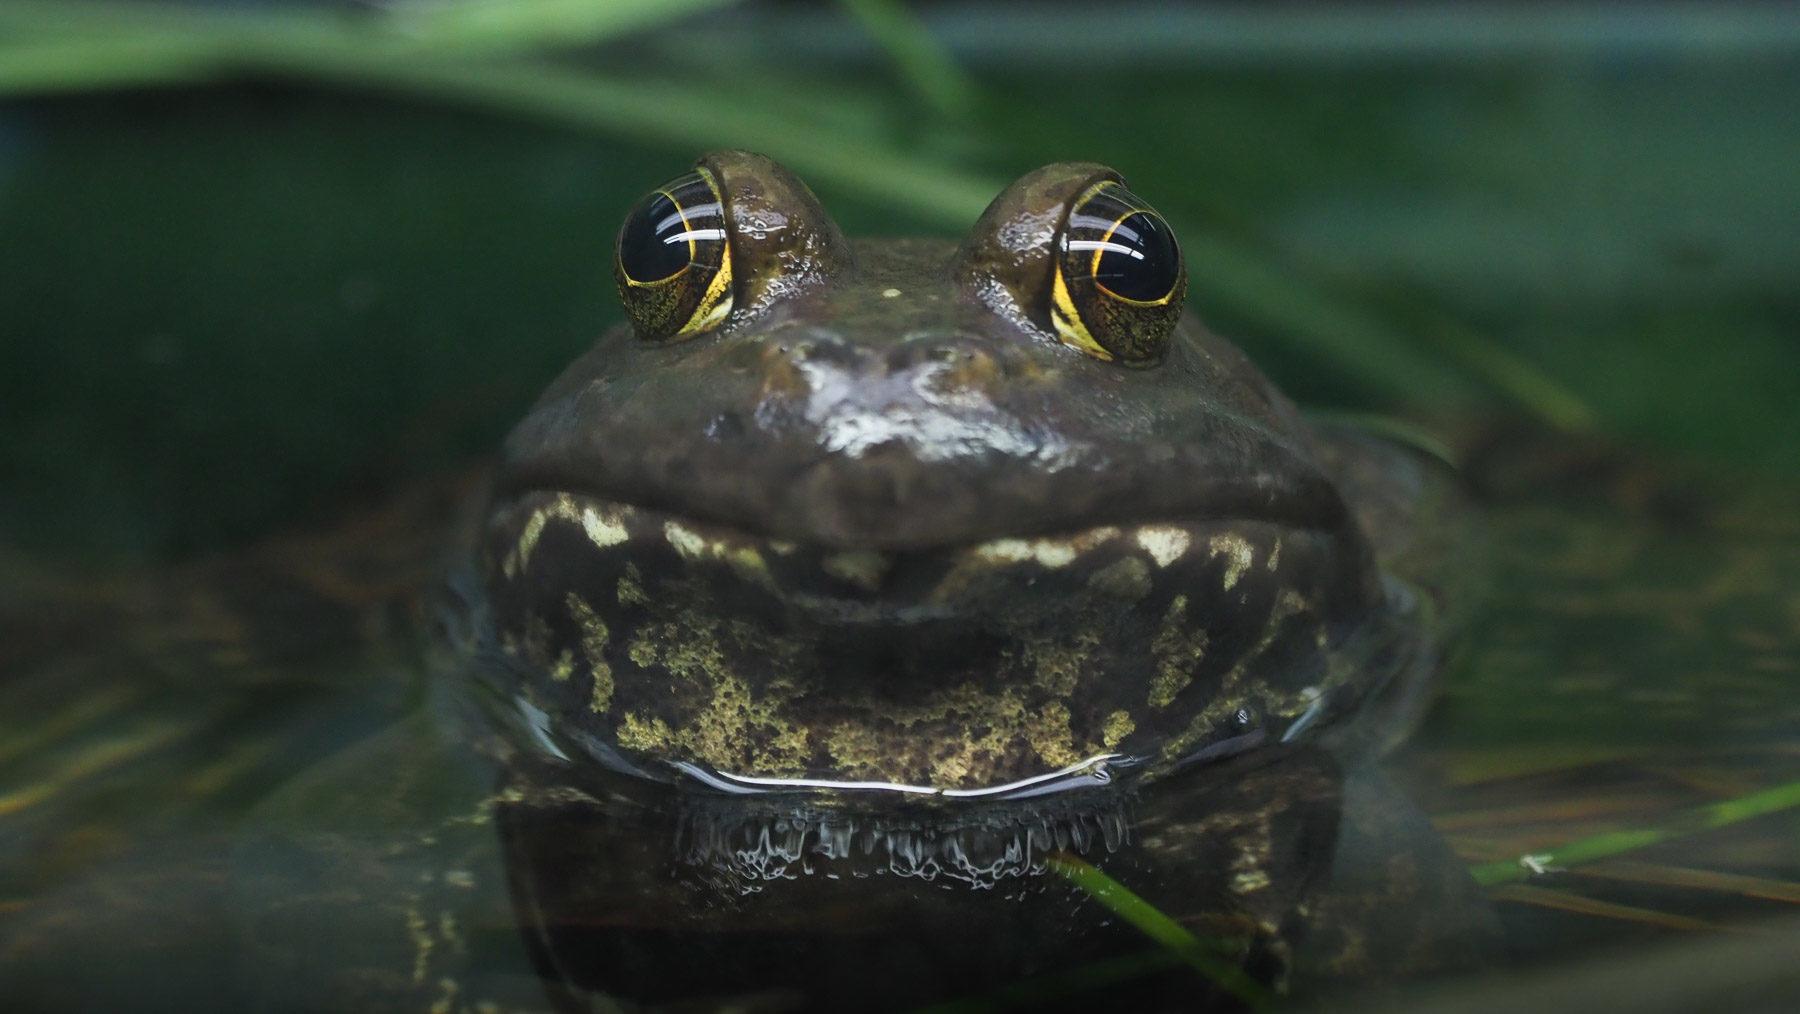 Sumpfkröte